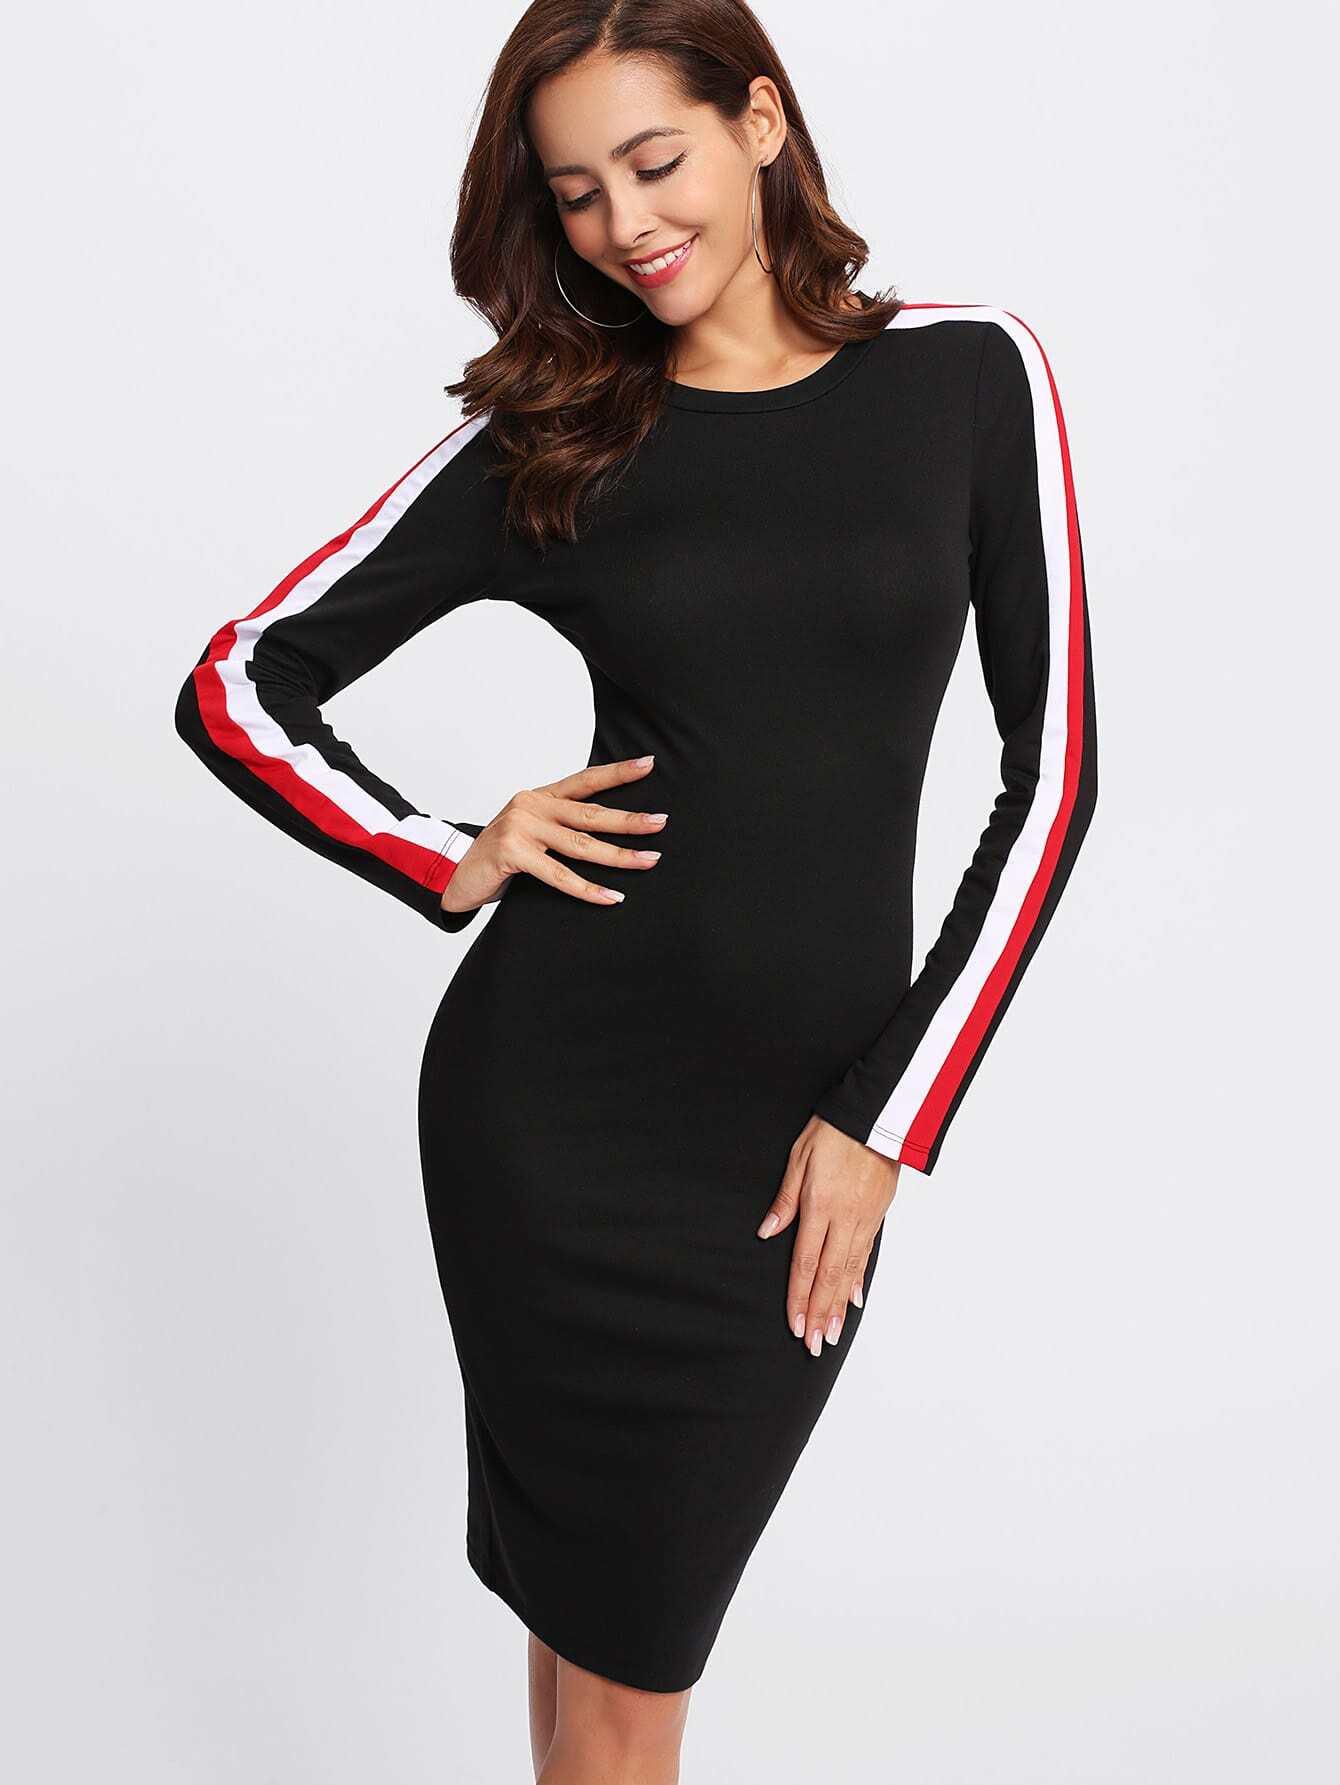 Striped Sleeve Form Fitting Dress metallic form fitting dress